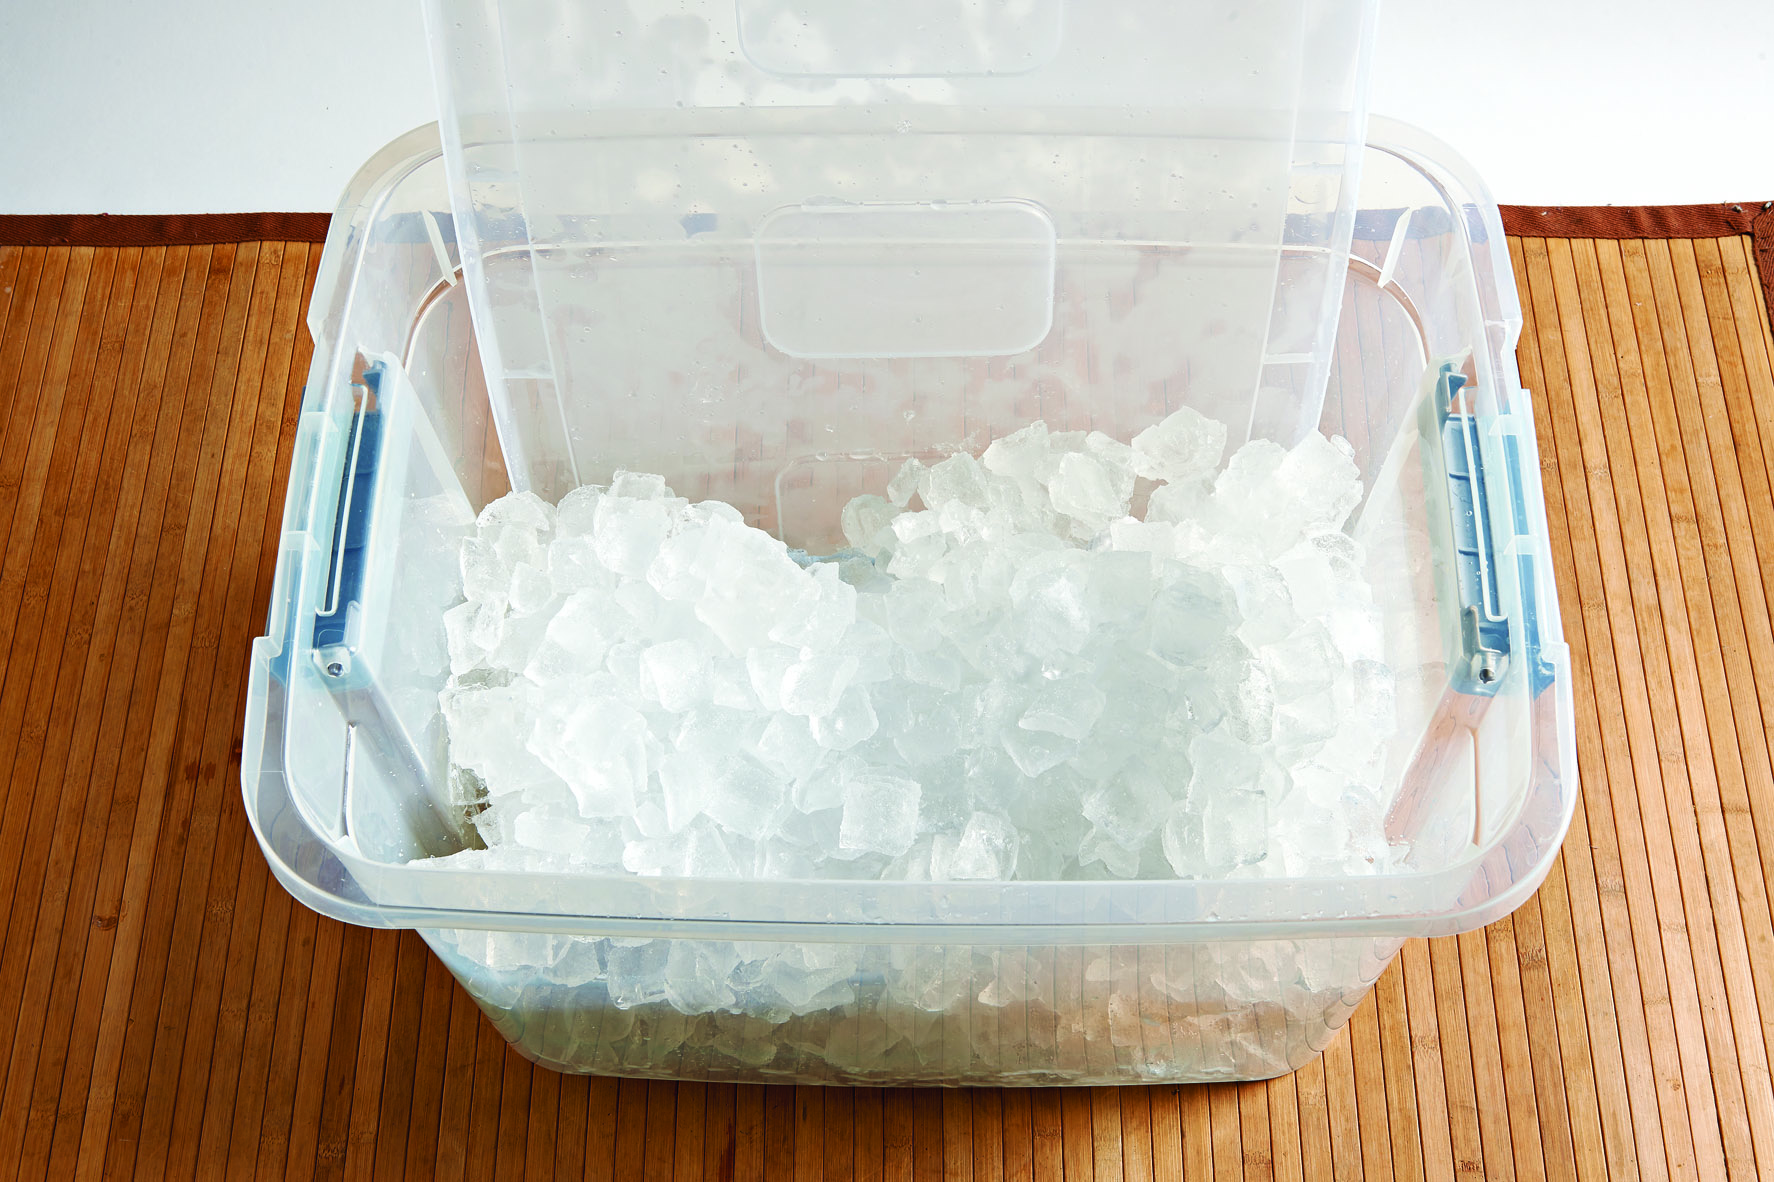 Plastic storage bin with ice